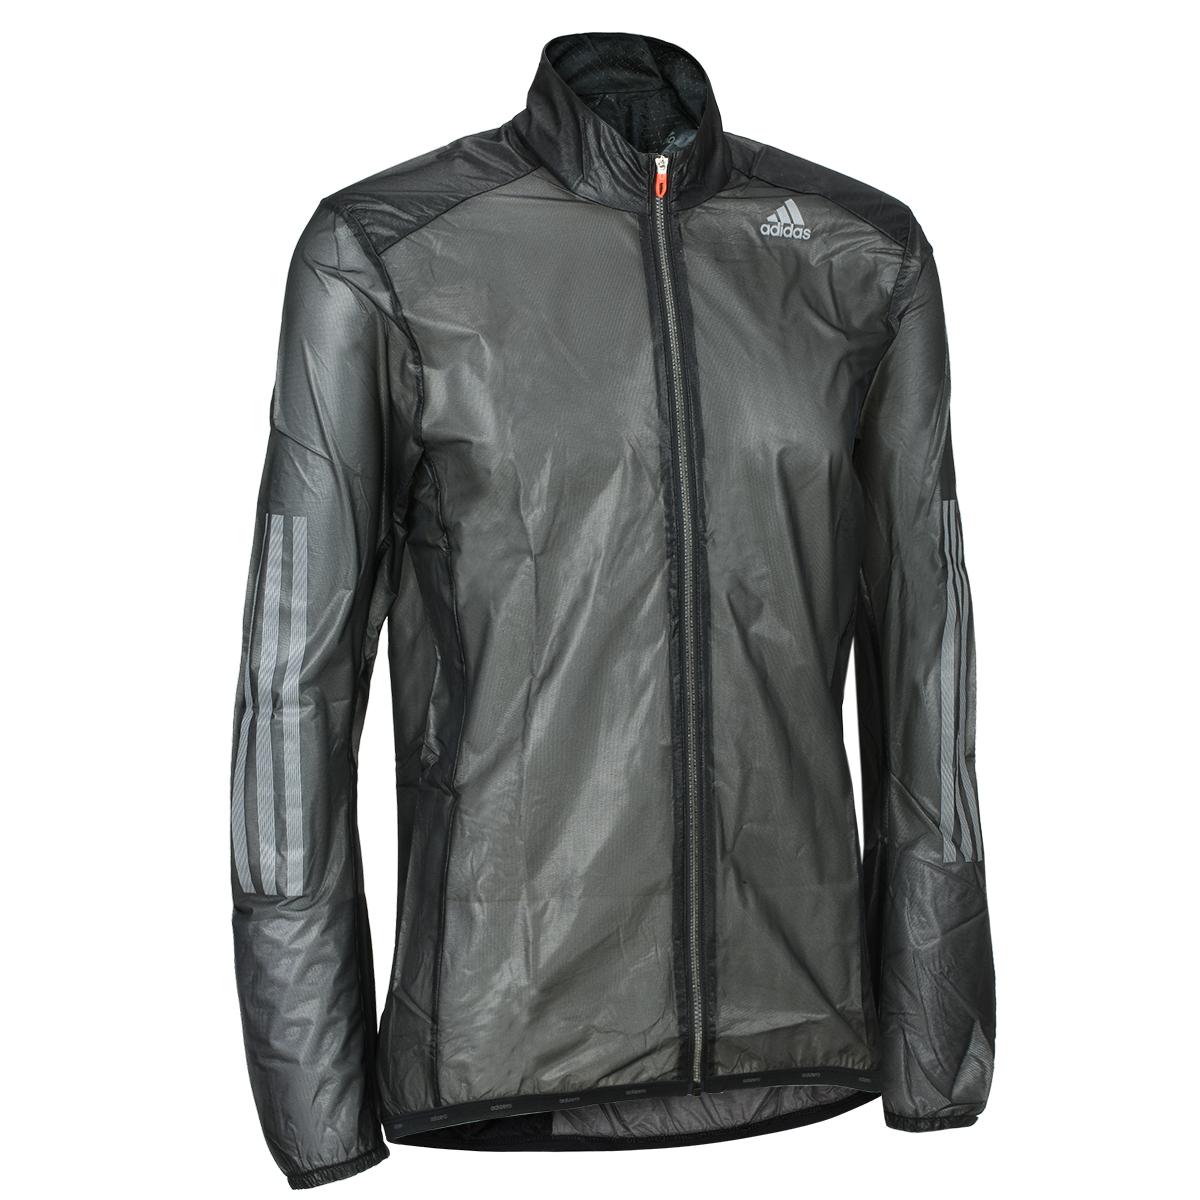 NEU adidas Herren Damen Jacke Adizero ClimaProof 150g Gr. S Laufjacke Running